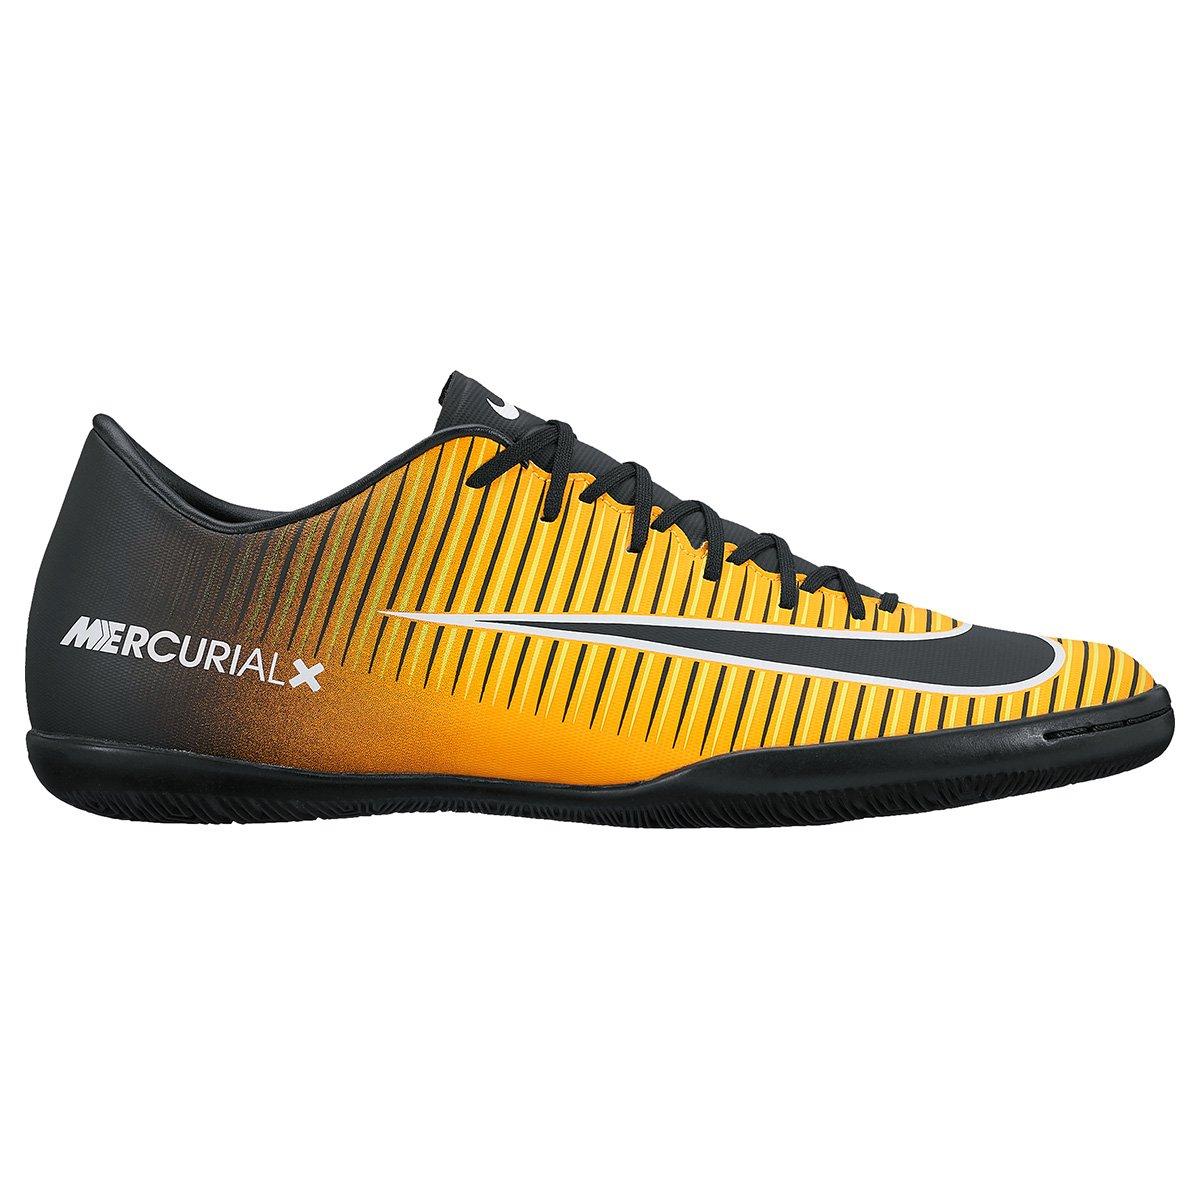 9682345f62 Chuteira Futsal Nike Mercurial Victory 6 IC